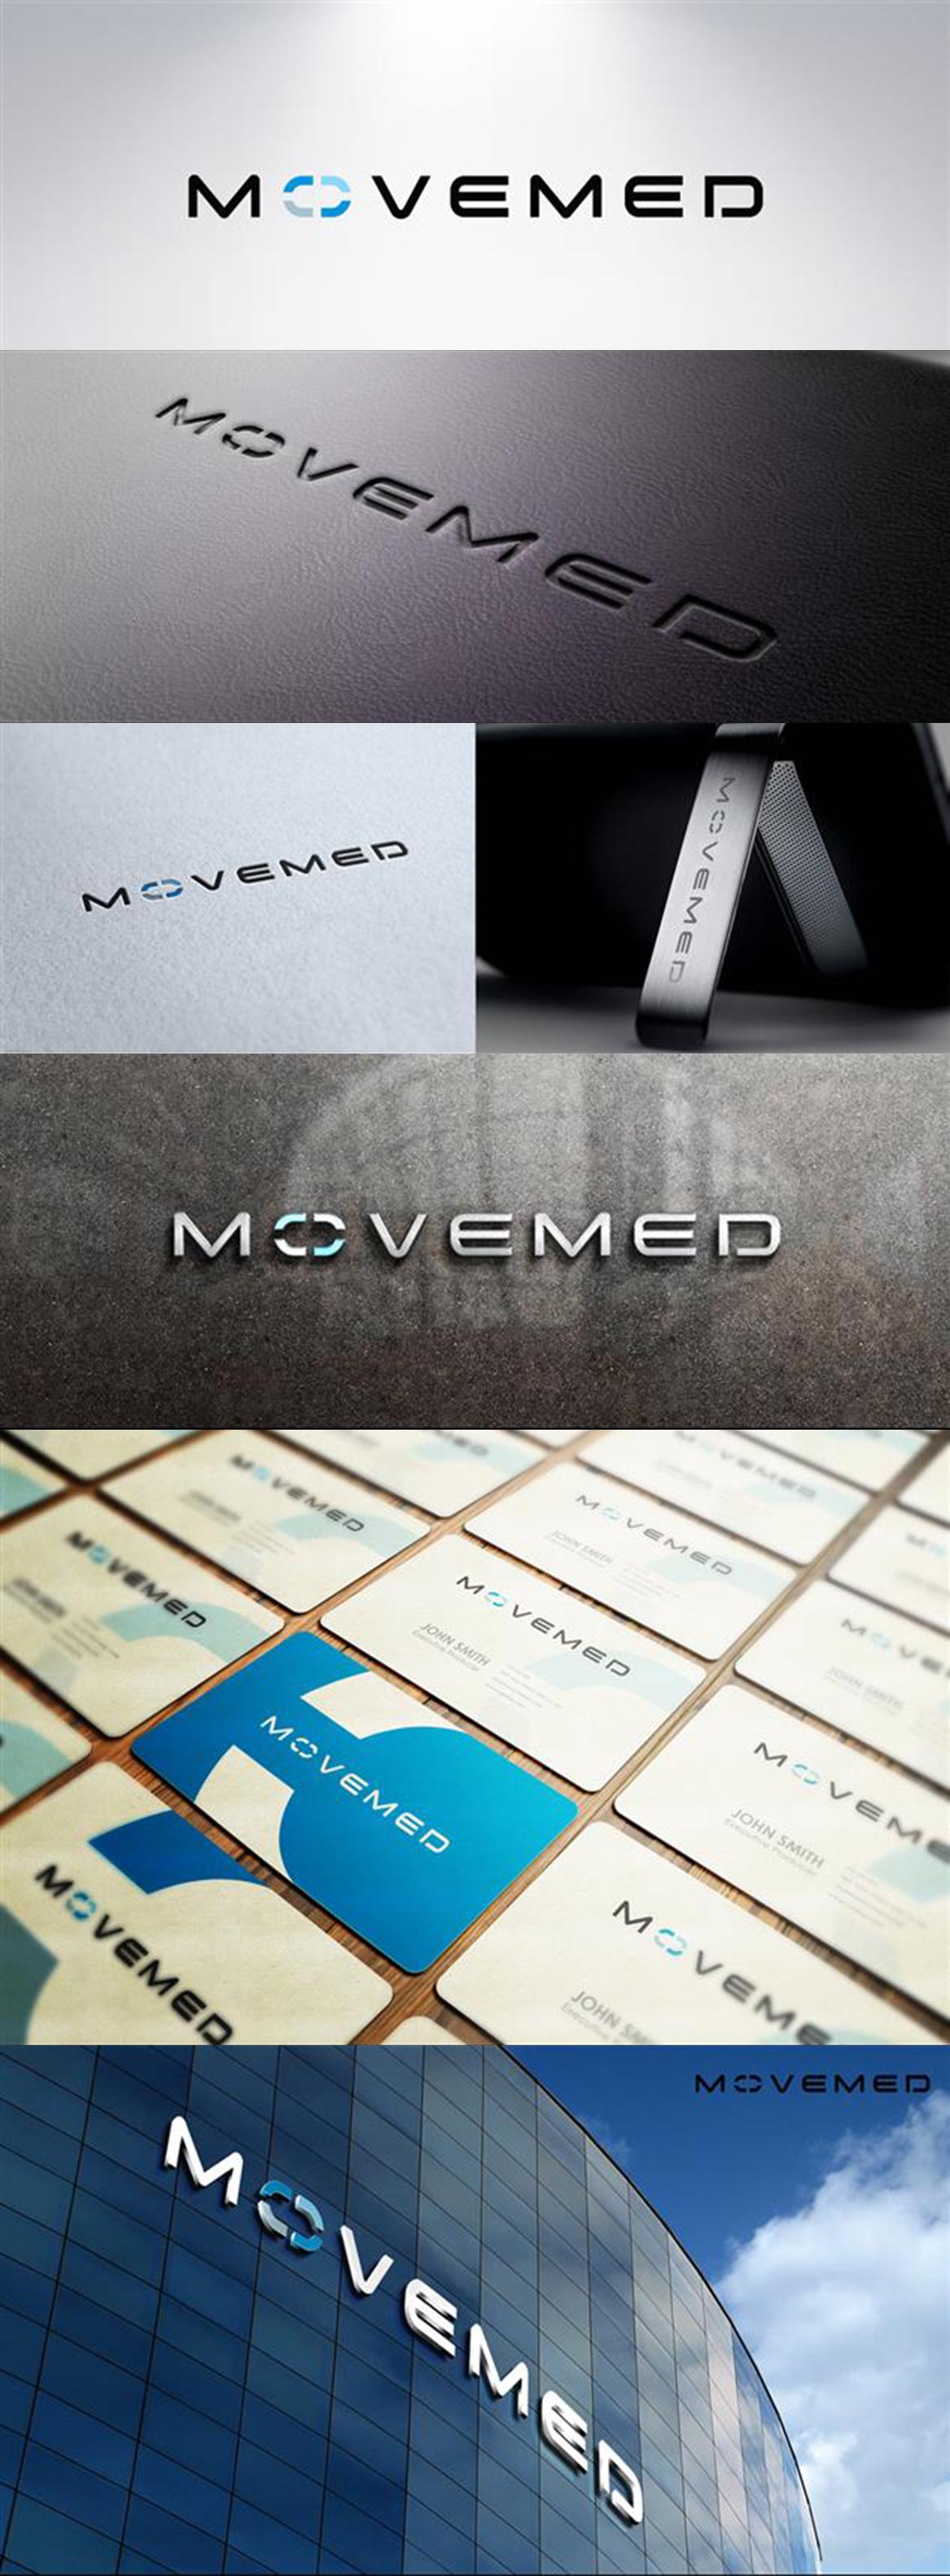 artcore-creative-logo-identity-design-movemedlogo